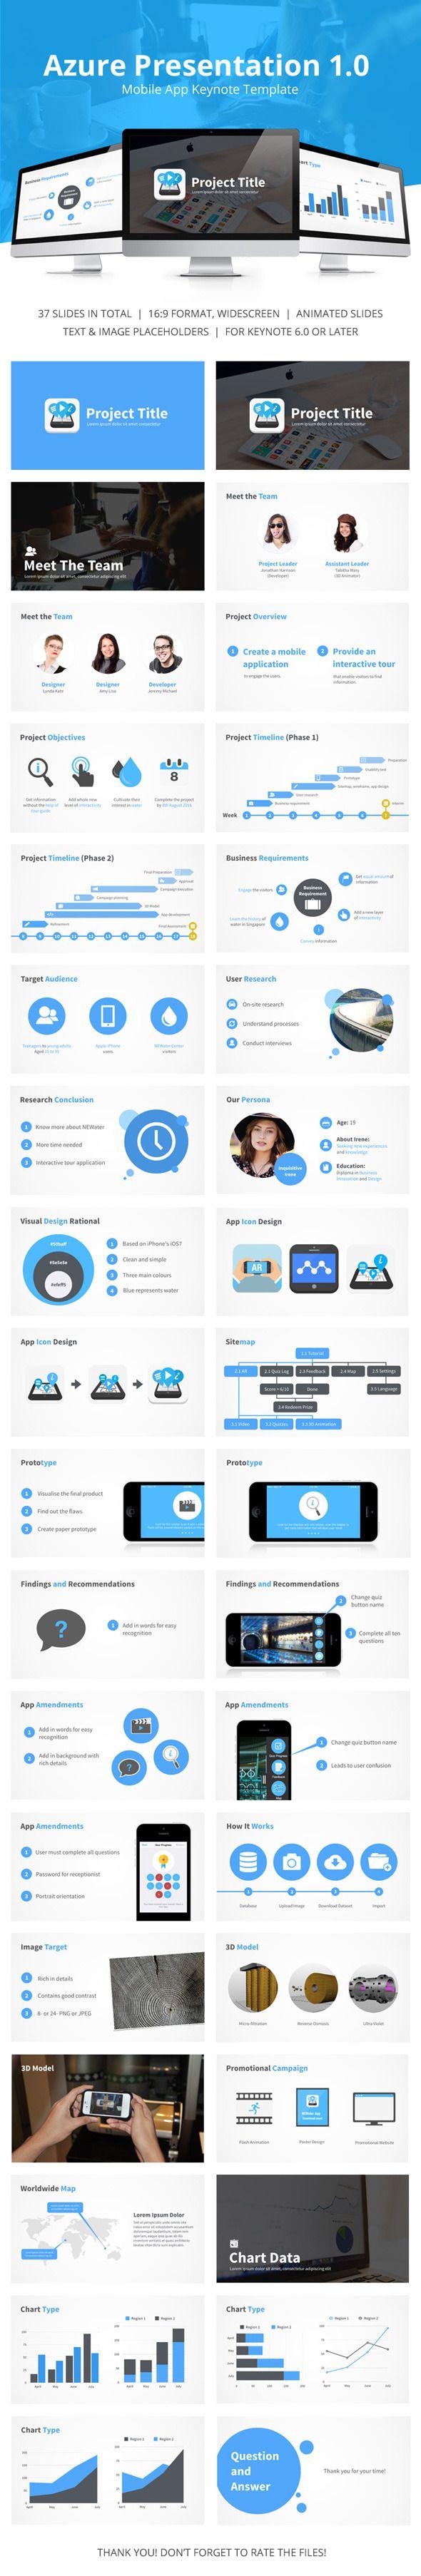 Azure Mobile App Presentation Template #design Download: http://graphicriver.net/item/azure-mobile-app-presentation/12328983?ref=ksioks